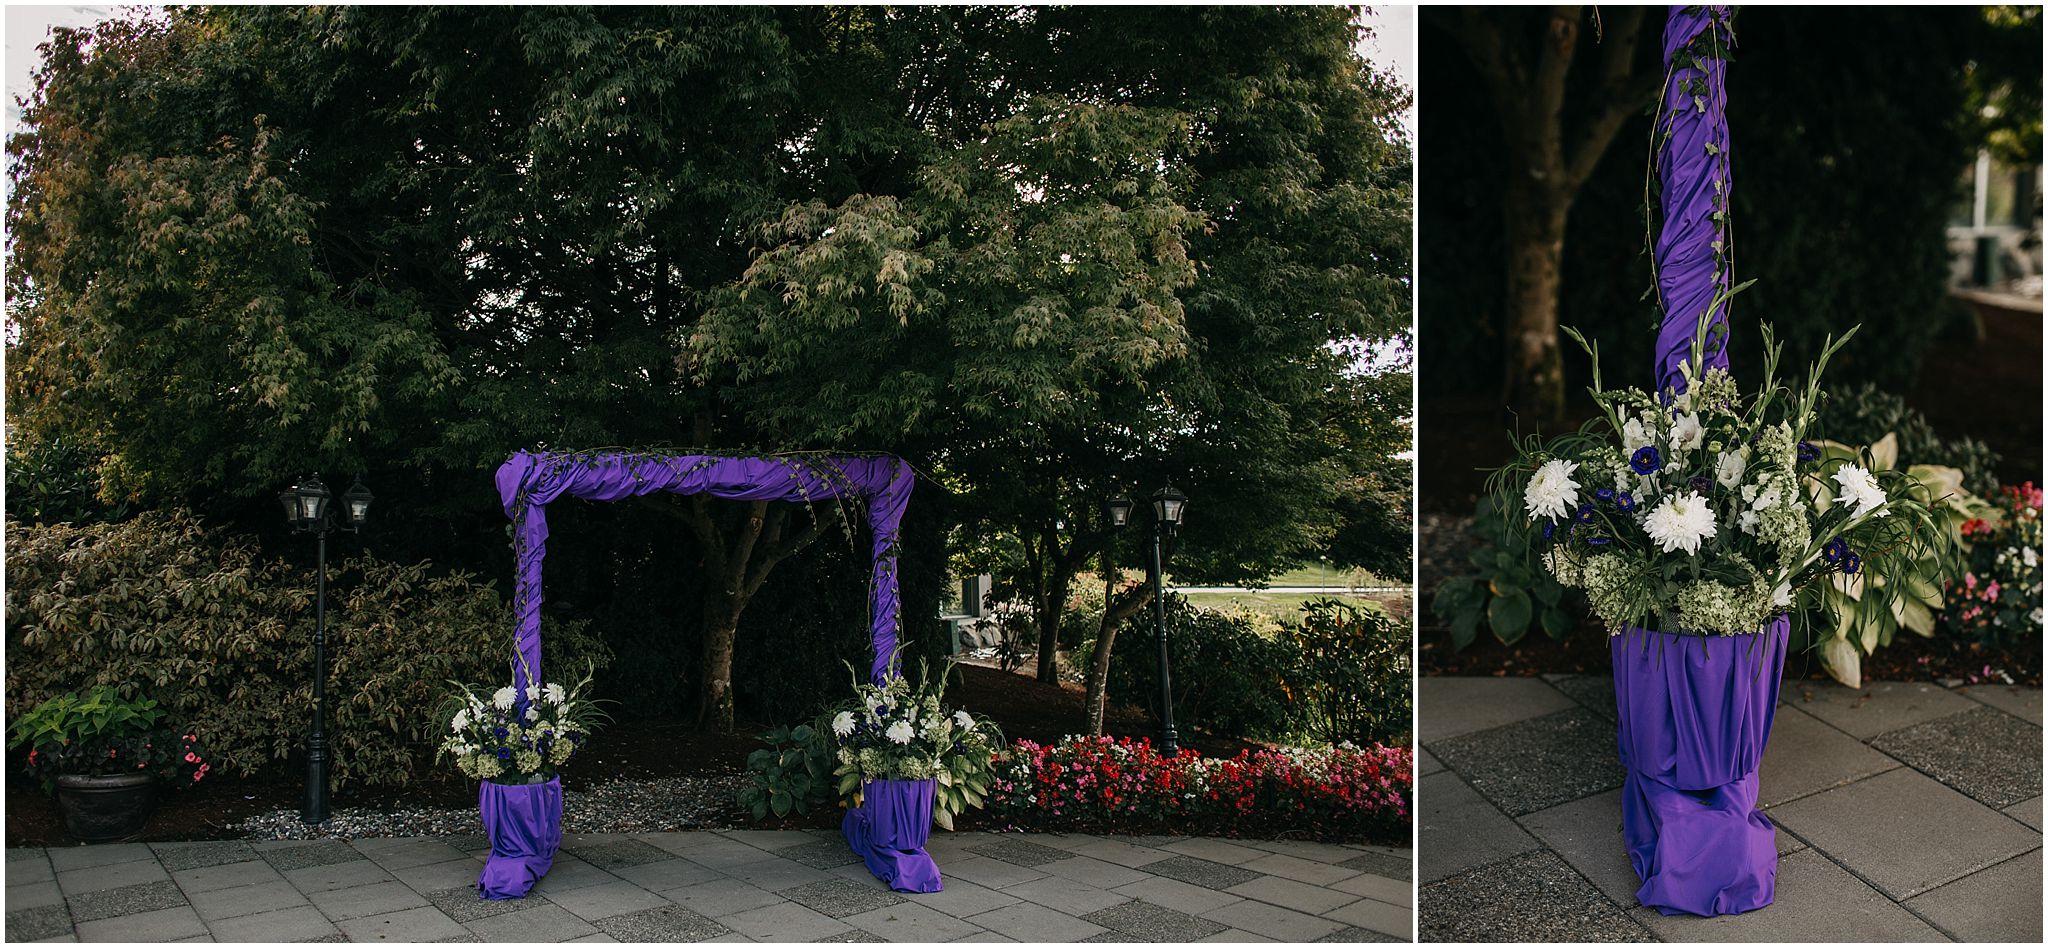 pitt meadows wedding arch flowers diy same sex couple